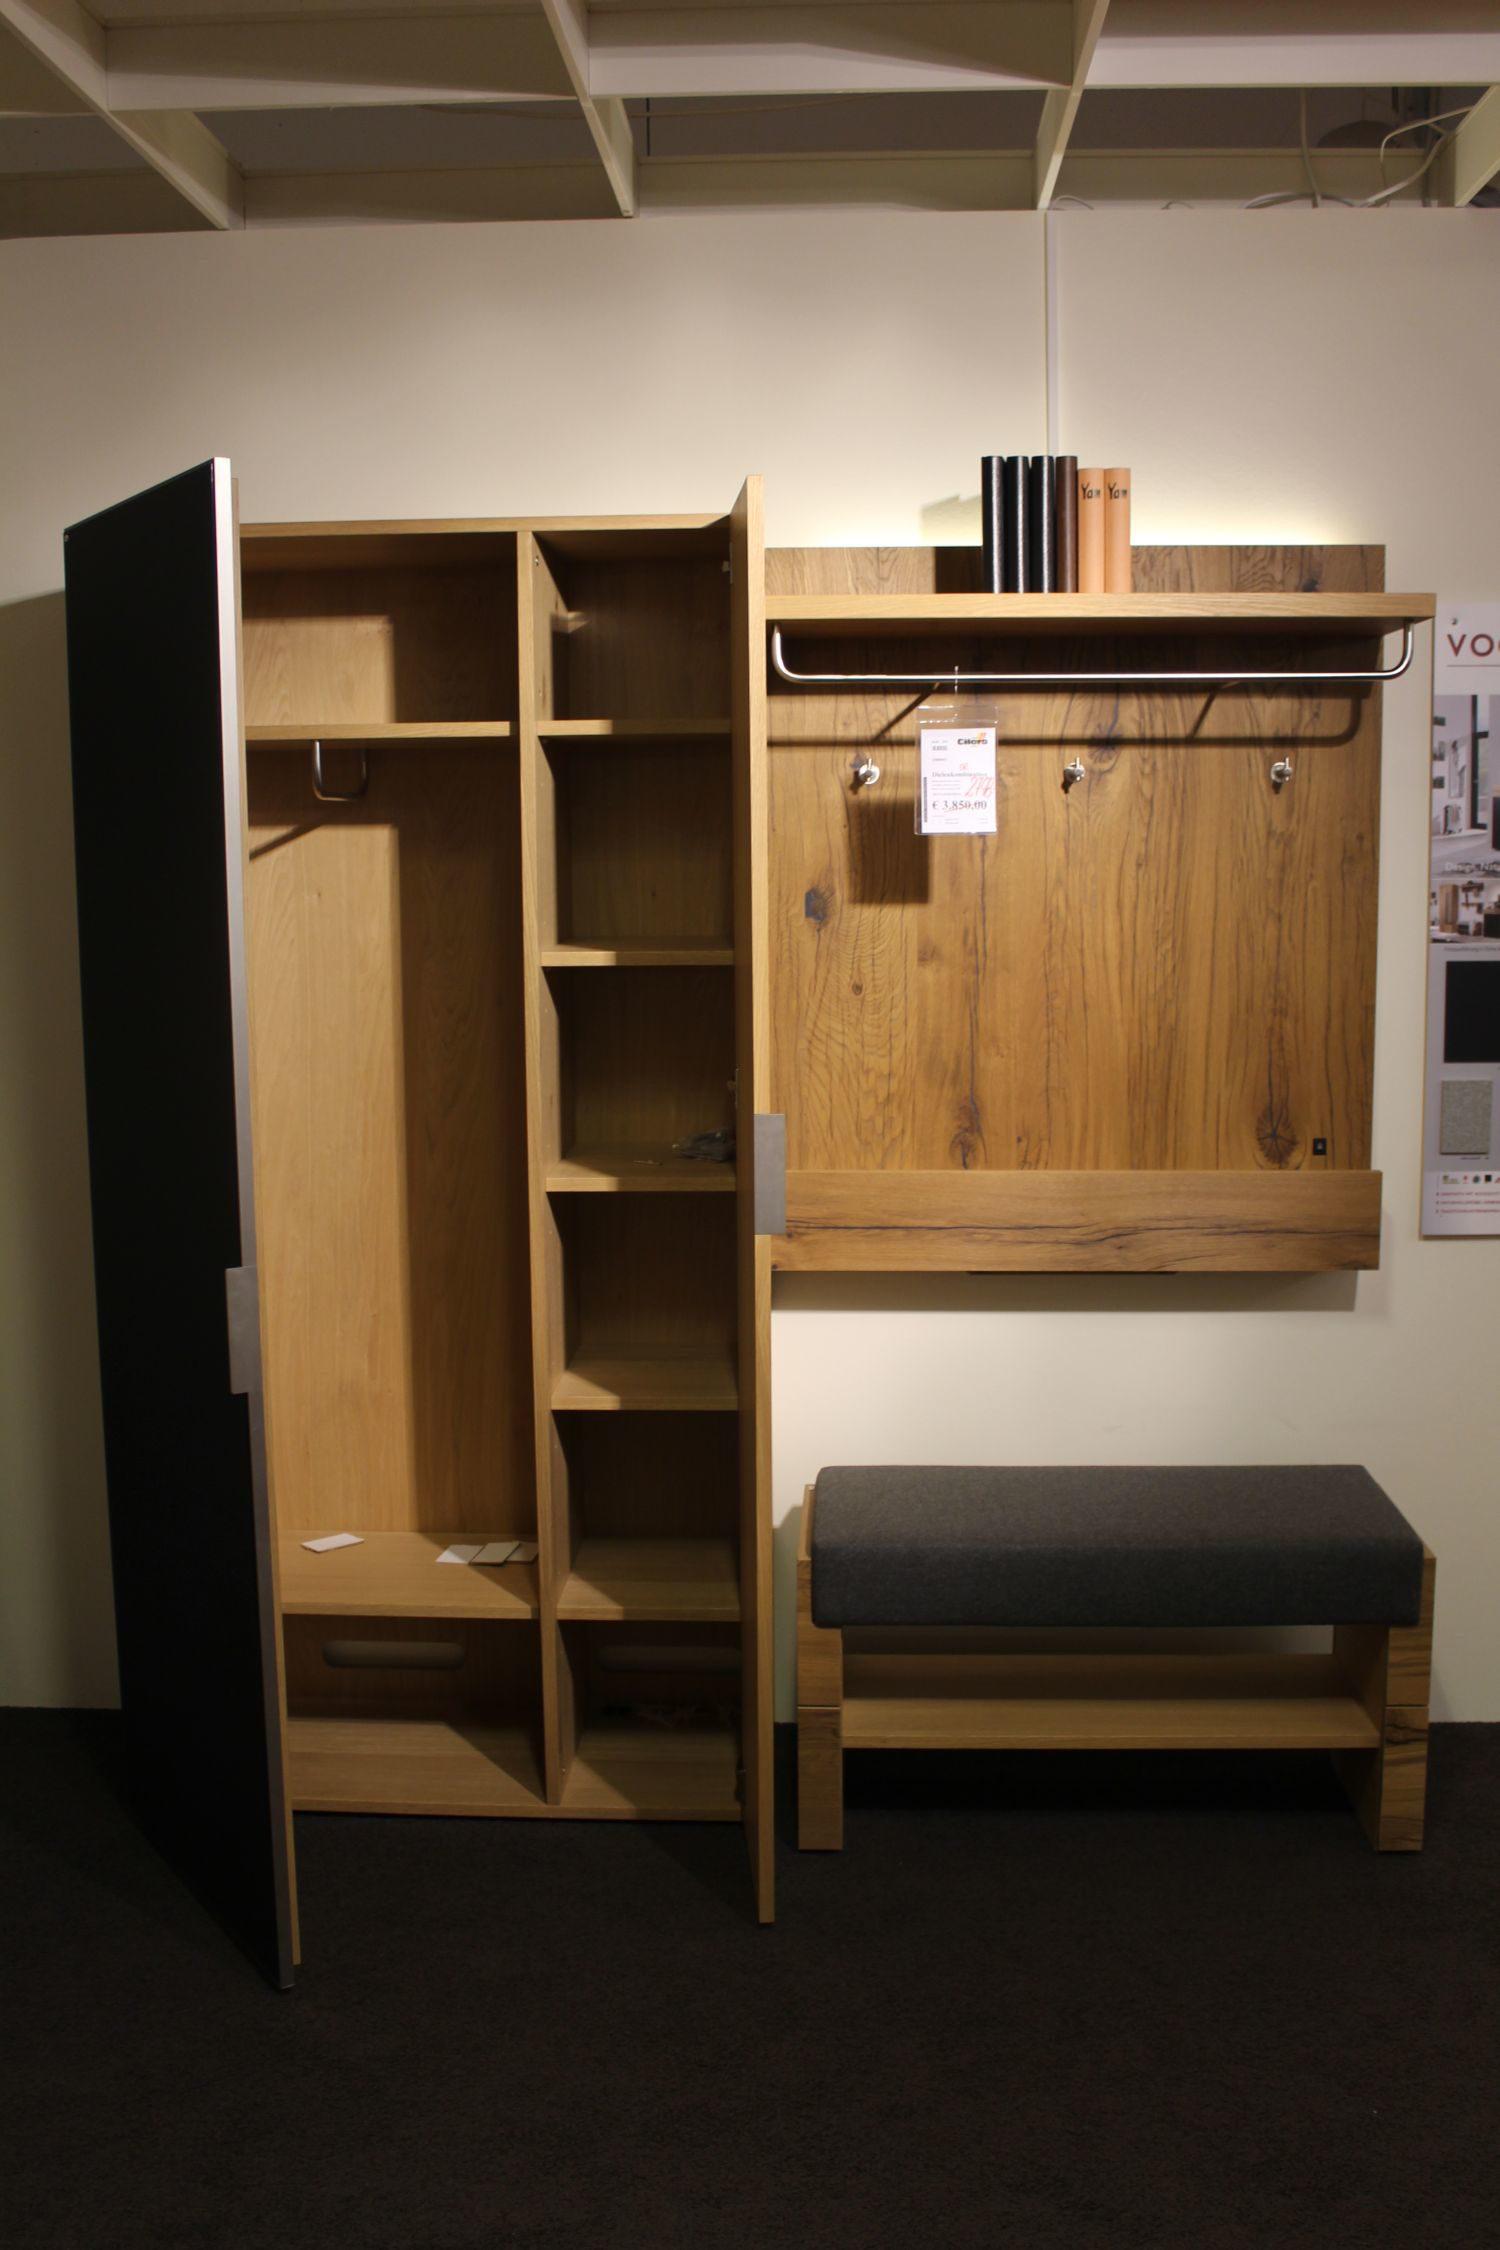 Blickfang Möbel Diele Ideen Von Ausstellungsstück Dielenkombination